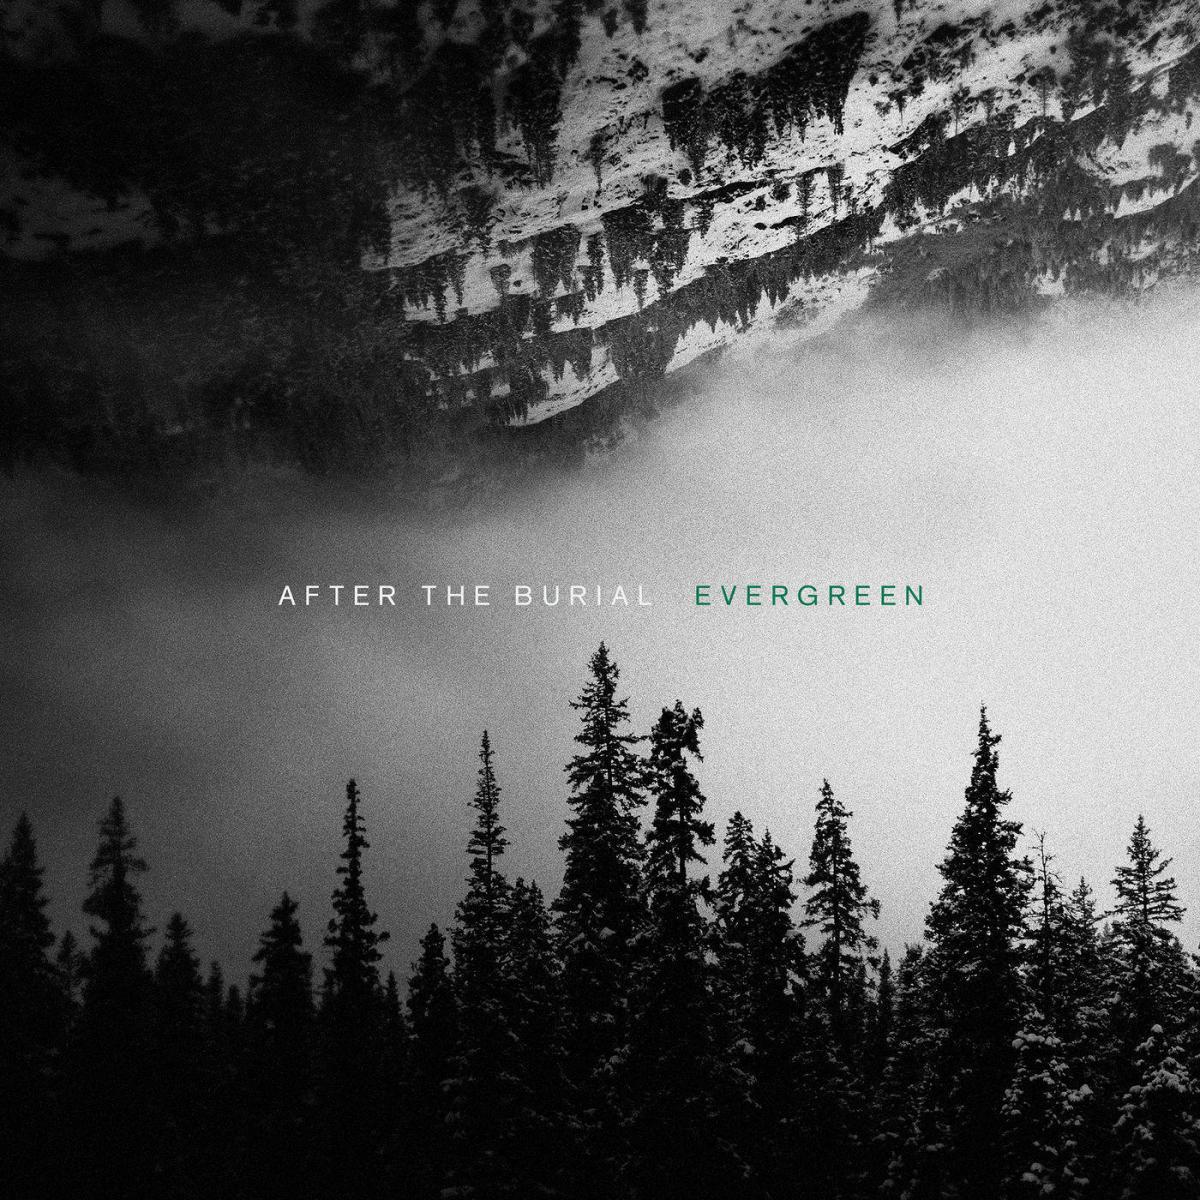 After The Burial annonce son nouvel album intitulé Evergreen